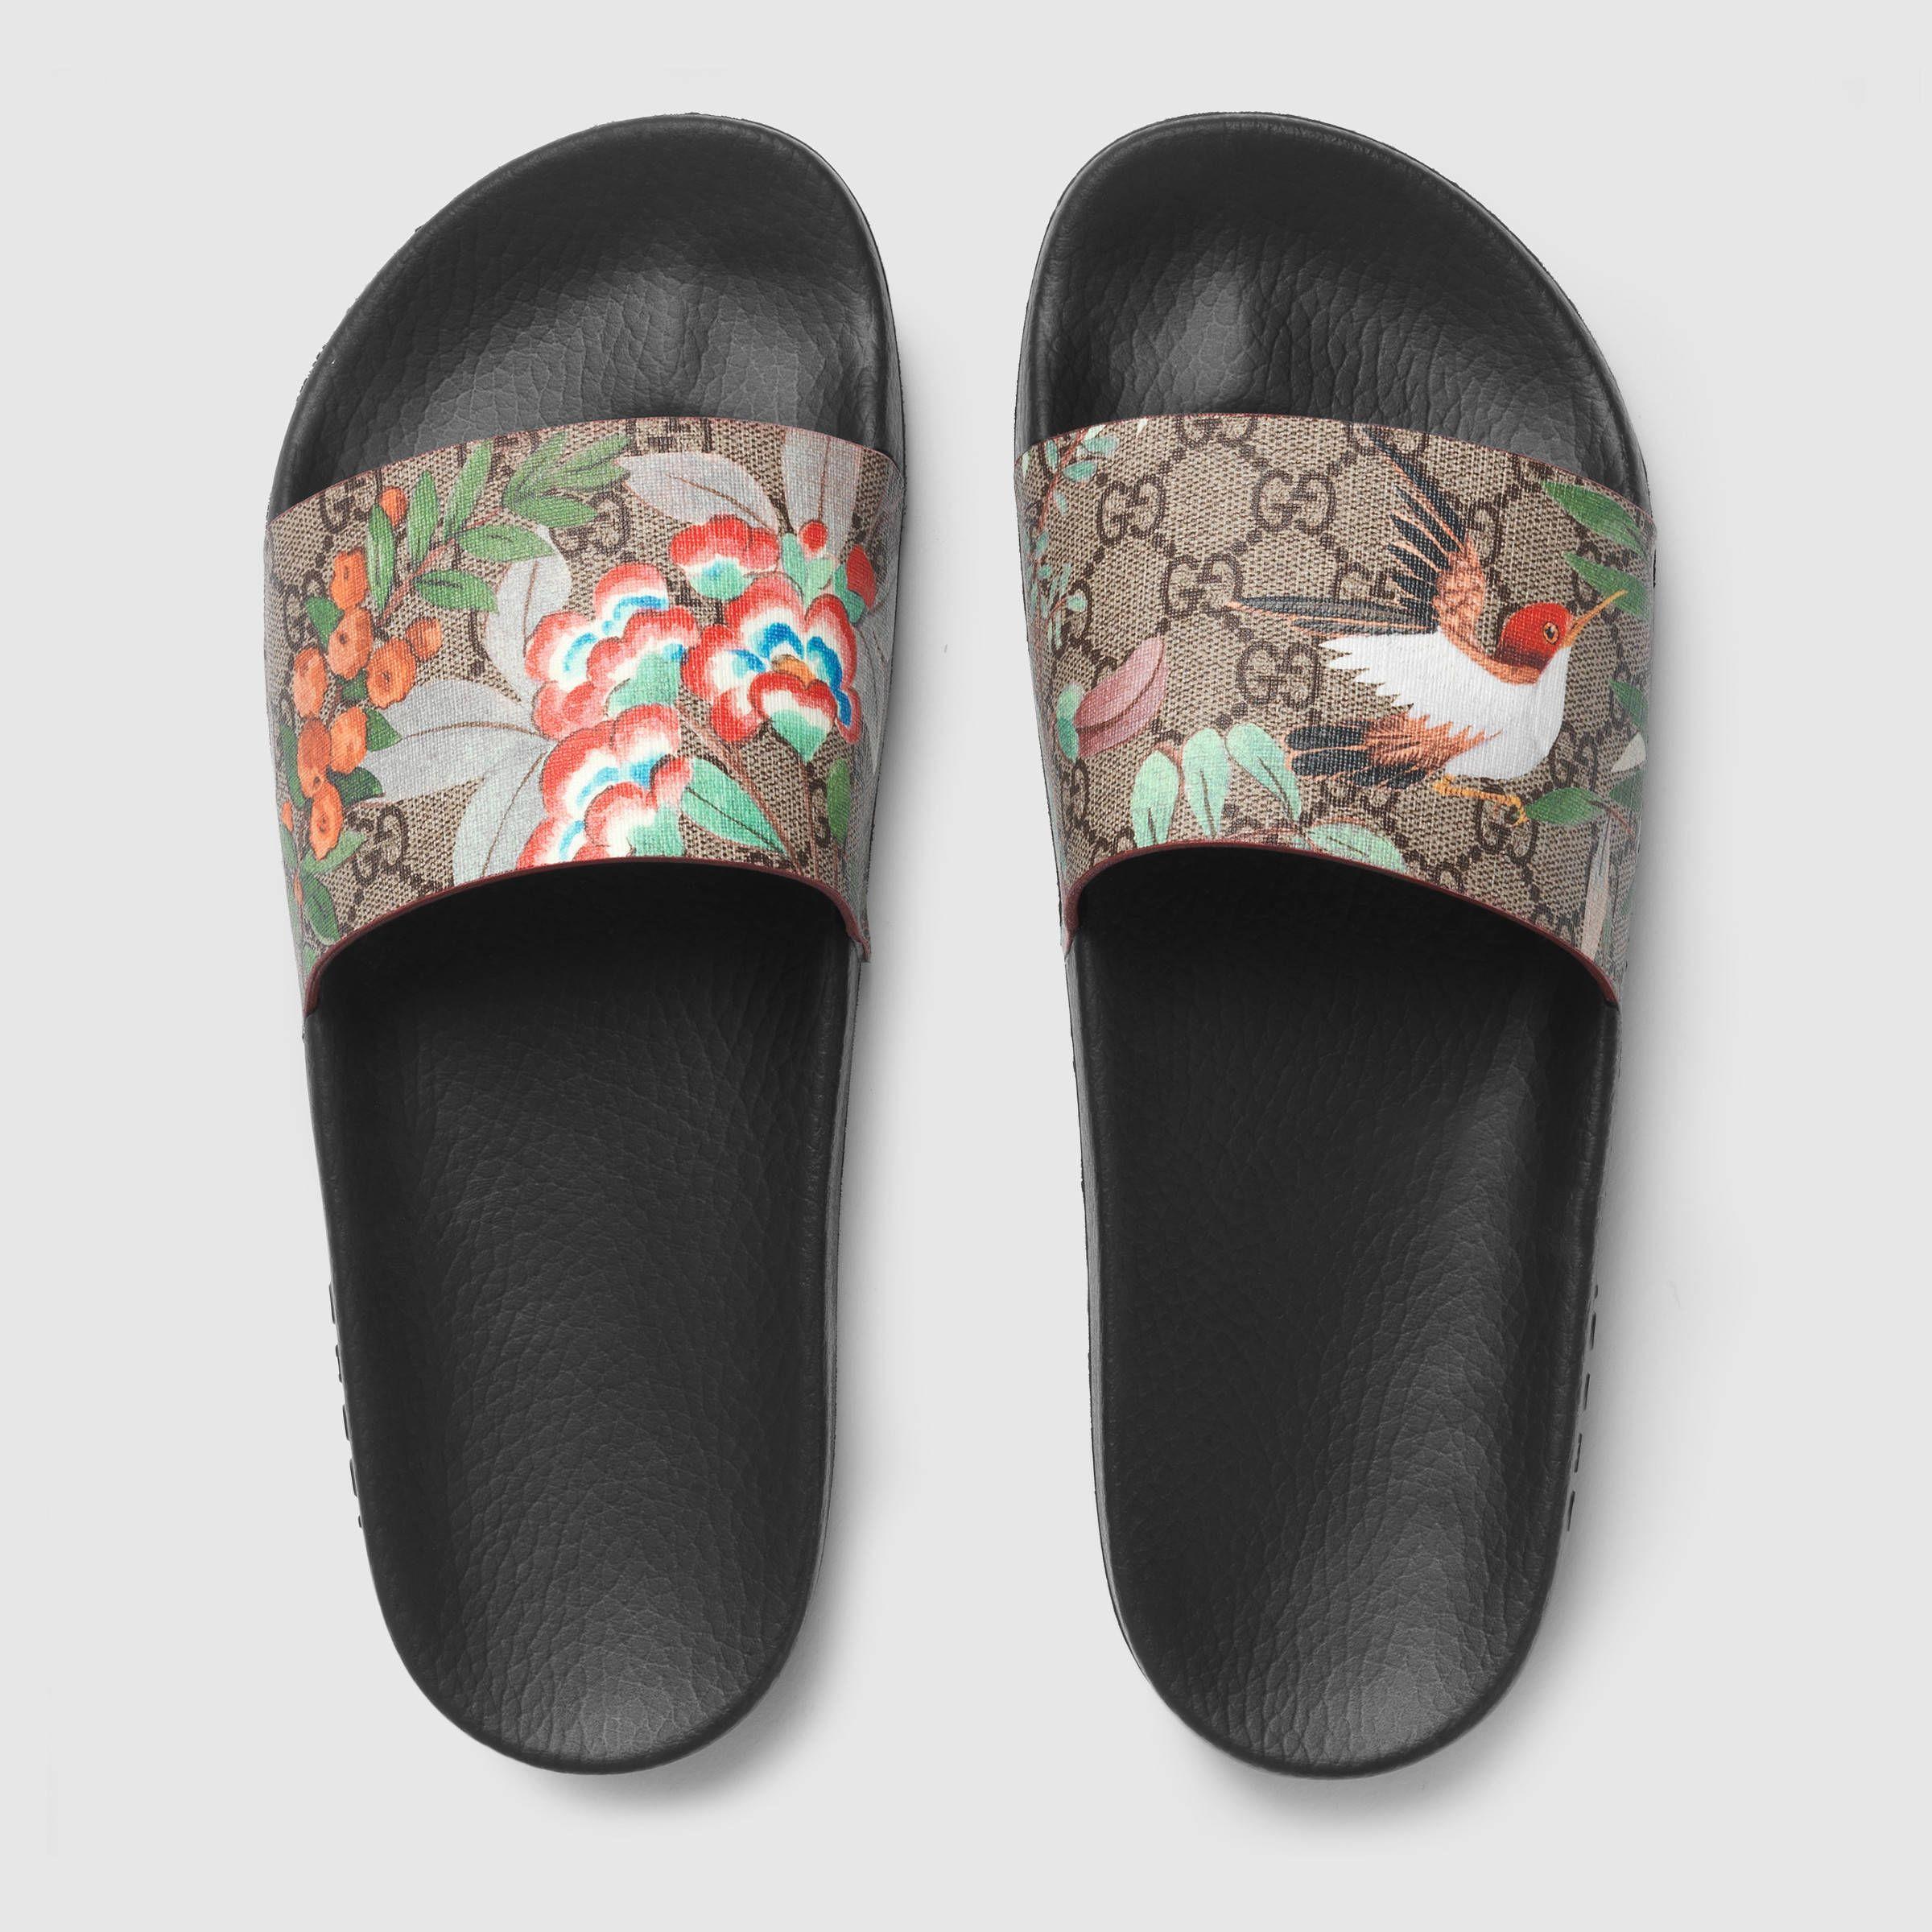 Gucci Men's Gucci Tian slide sandal